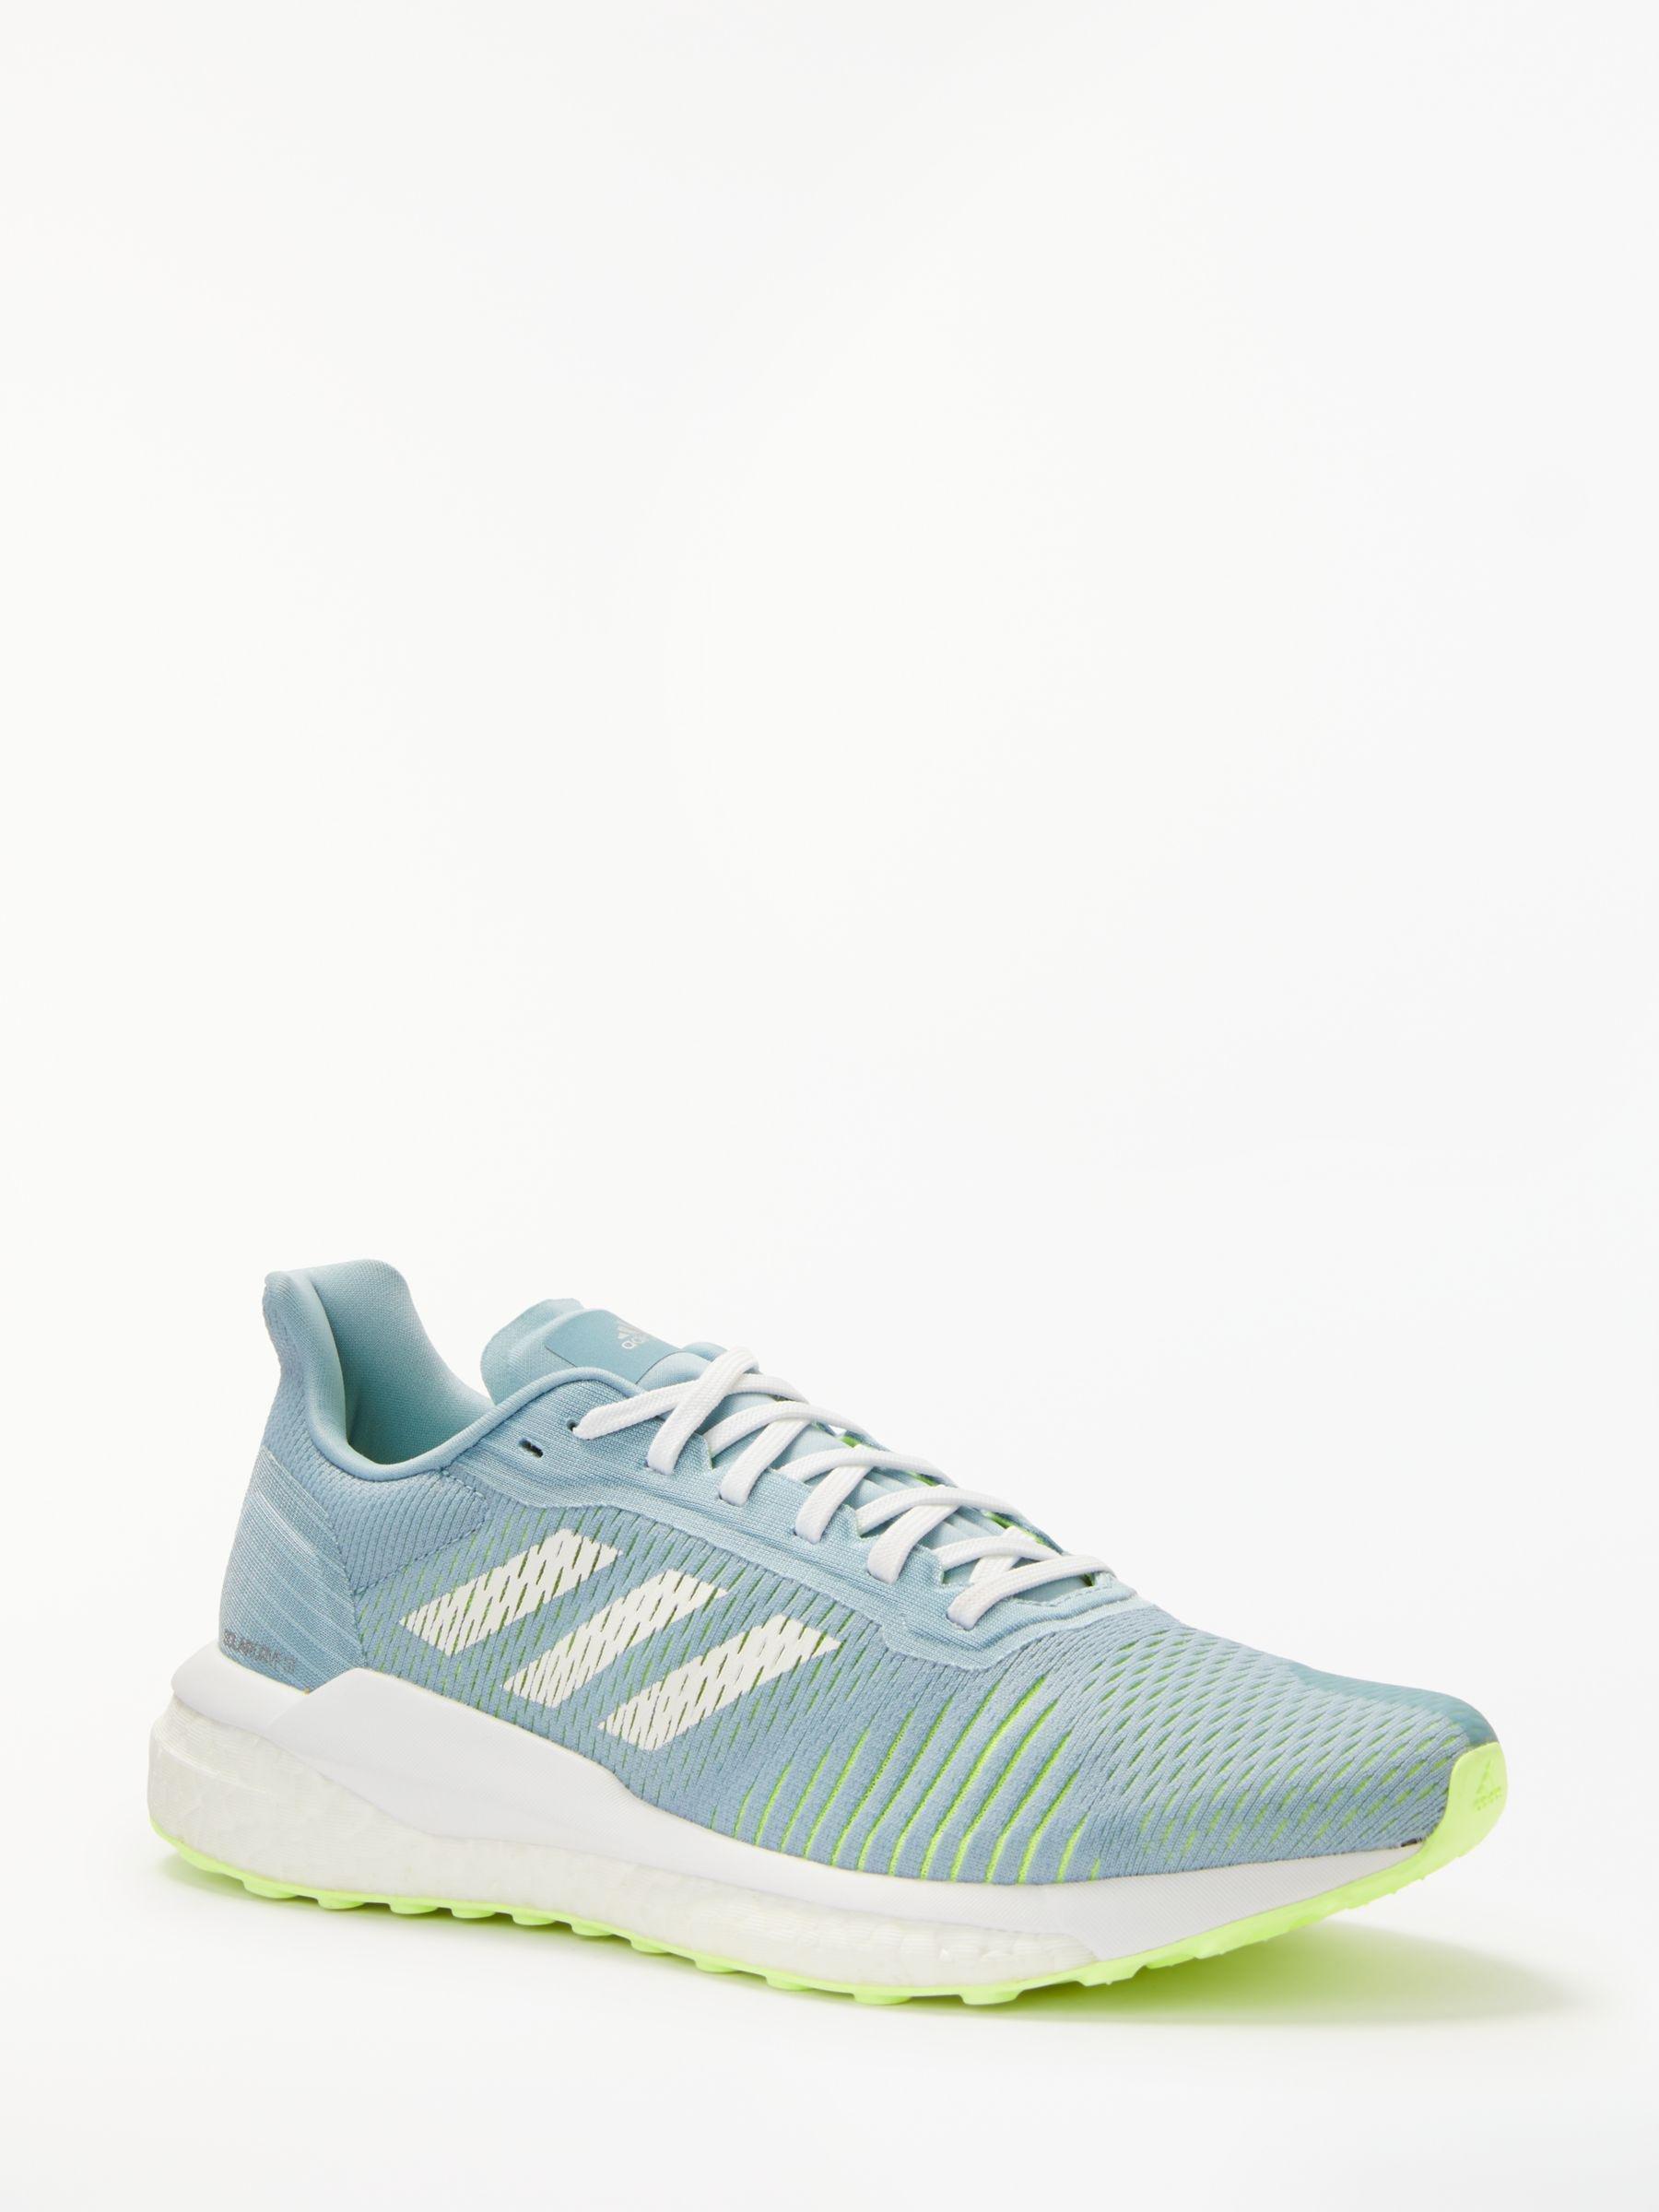 d0f2f024944 adidas Solar Drive St Women s Running Shoes - Lyst